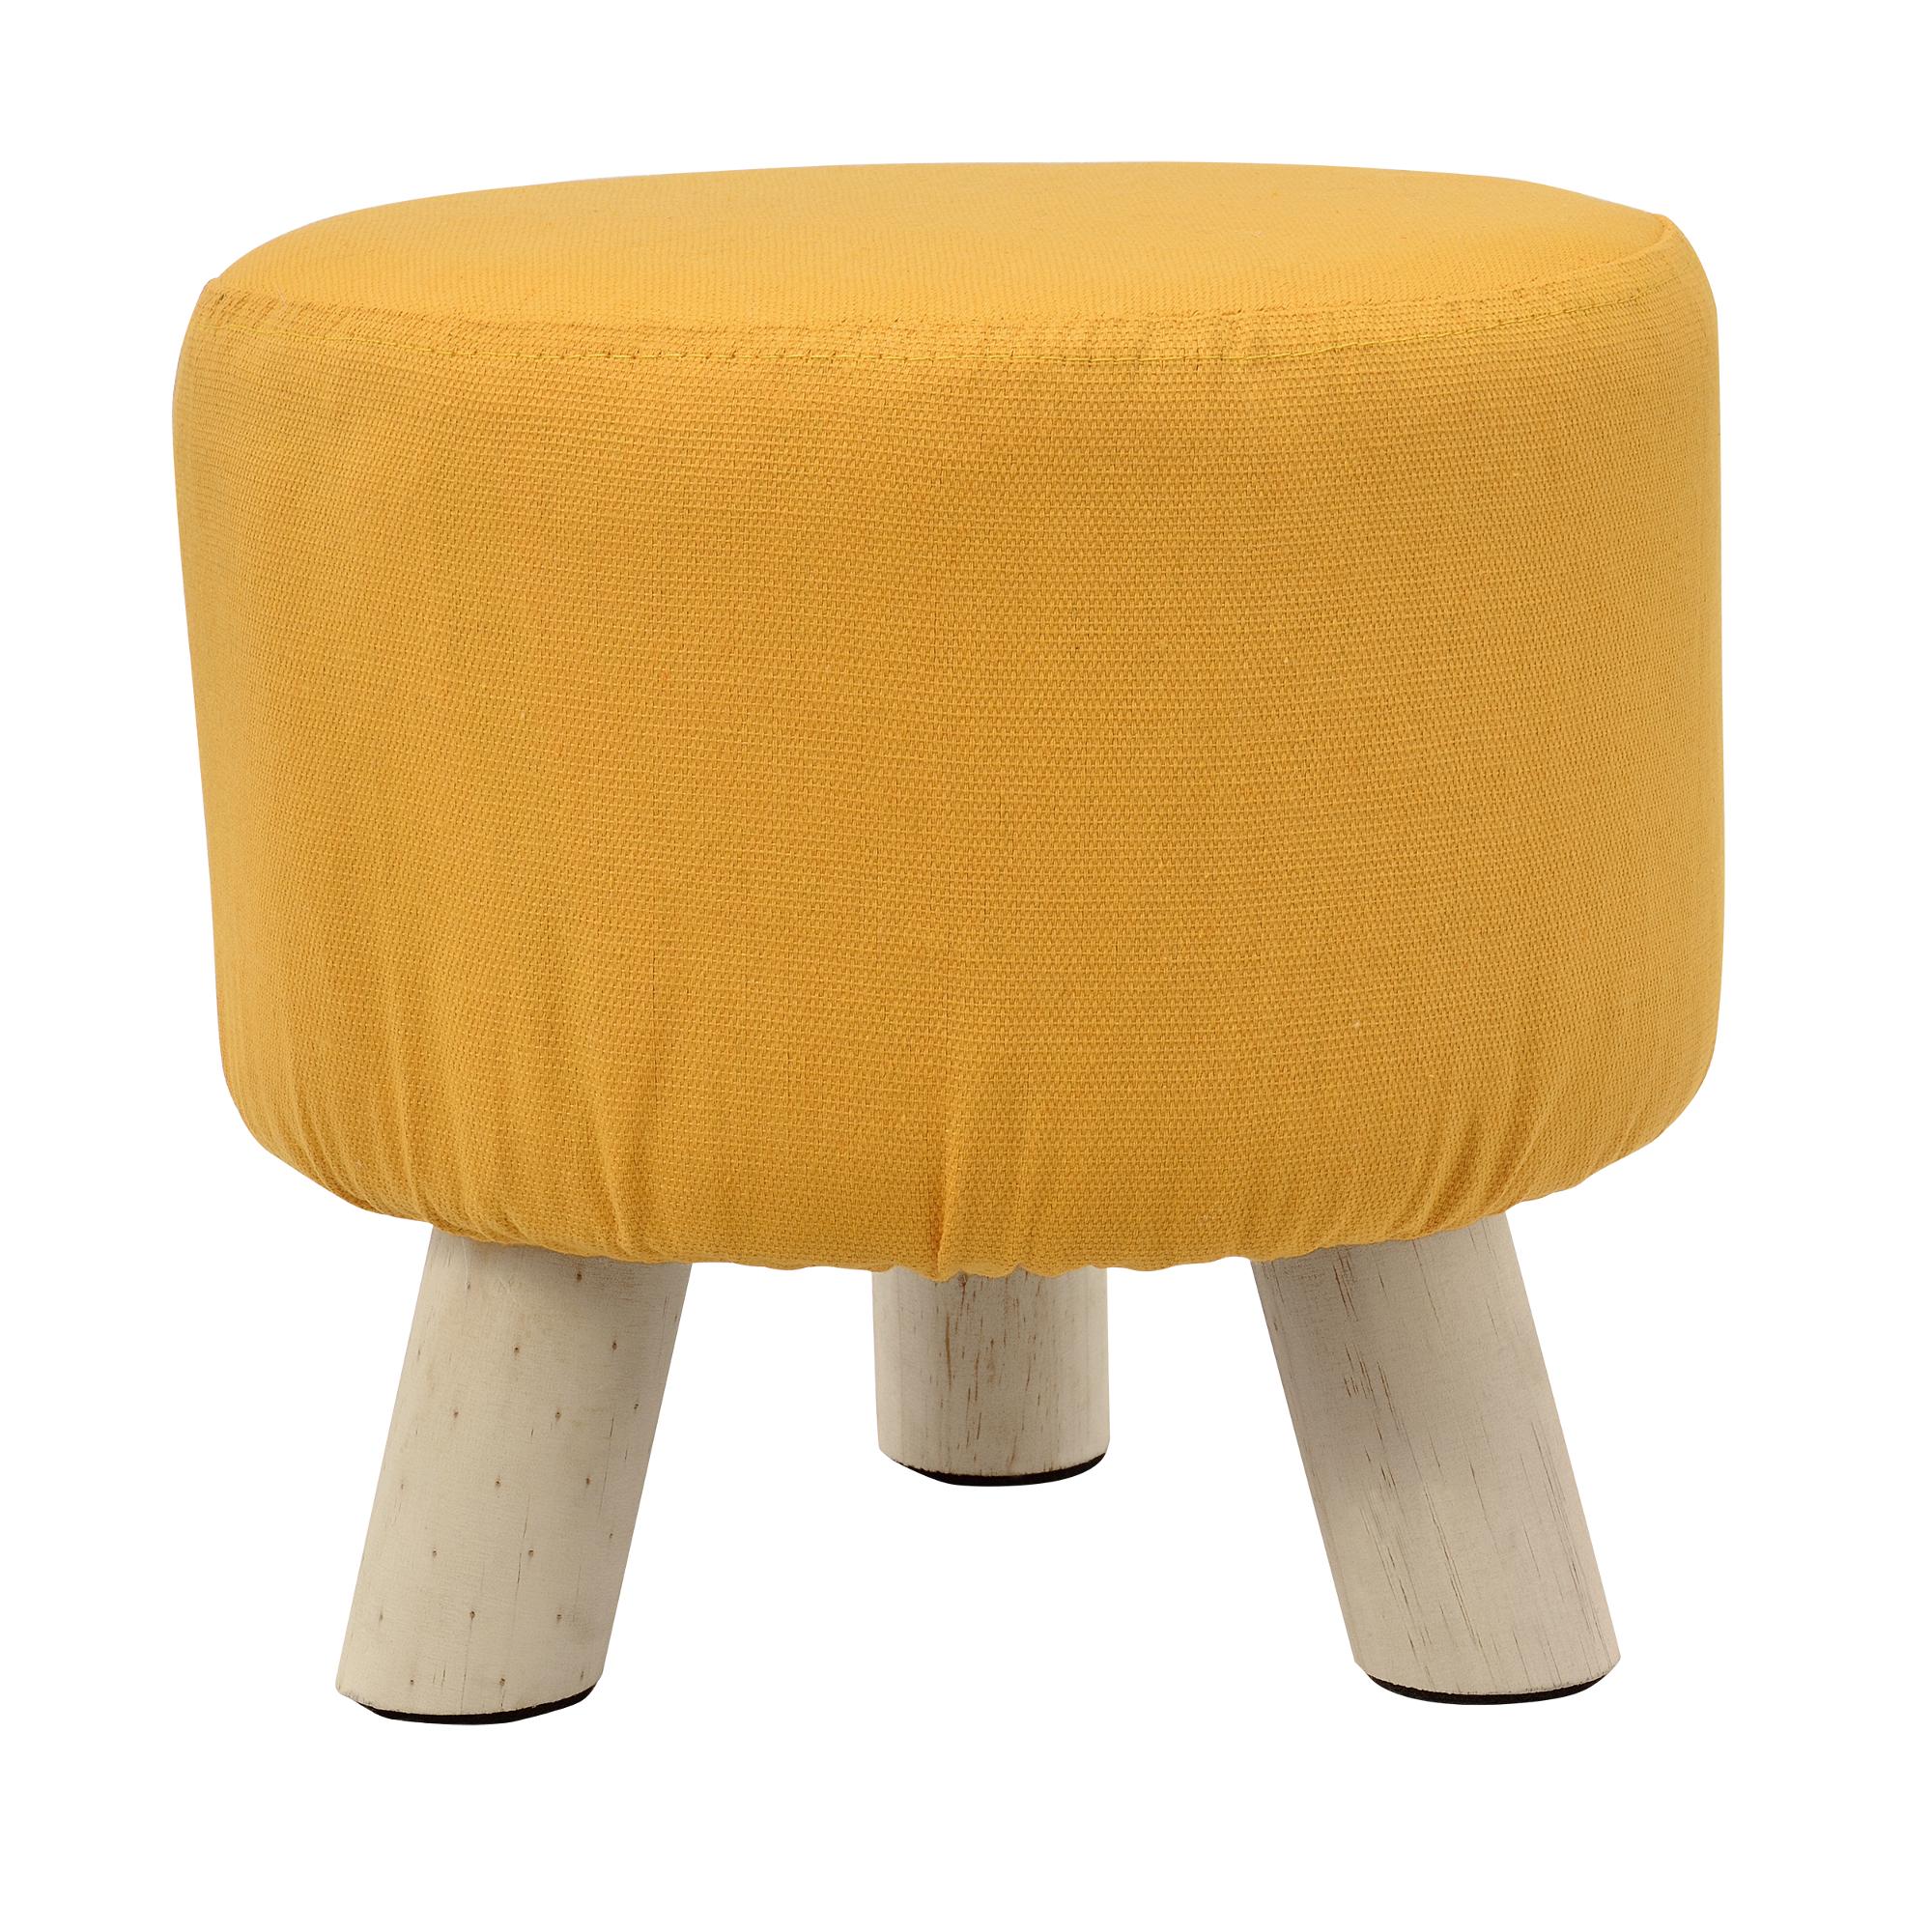 sitz hocker senf farben polsterhocker. Black Bedroom Furniture Sets. Home Design Ideas